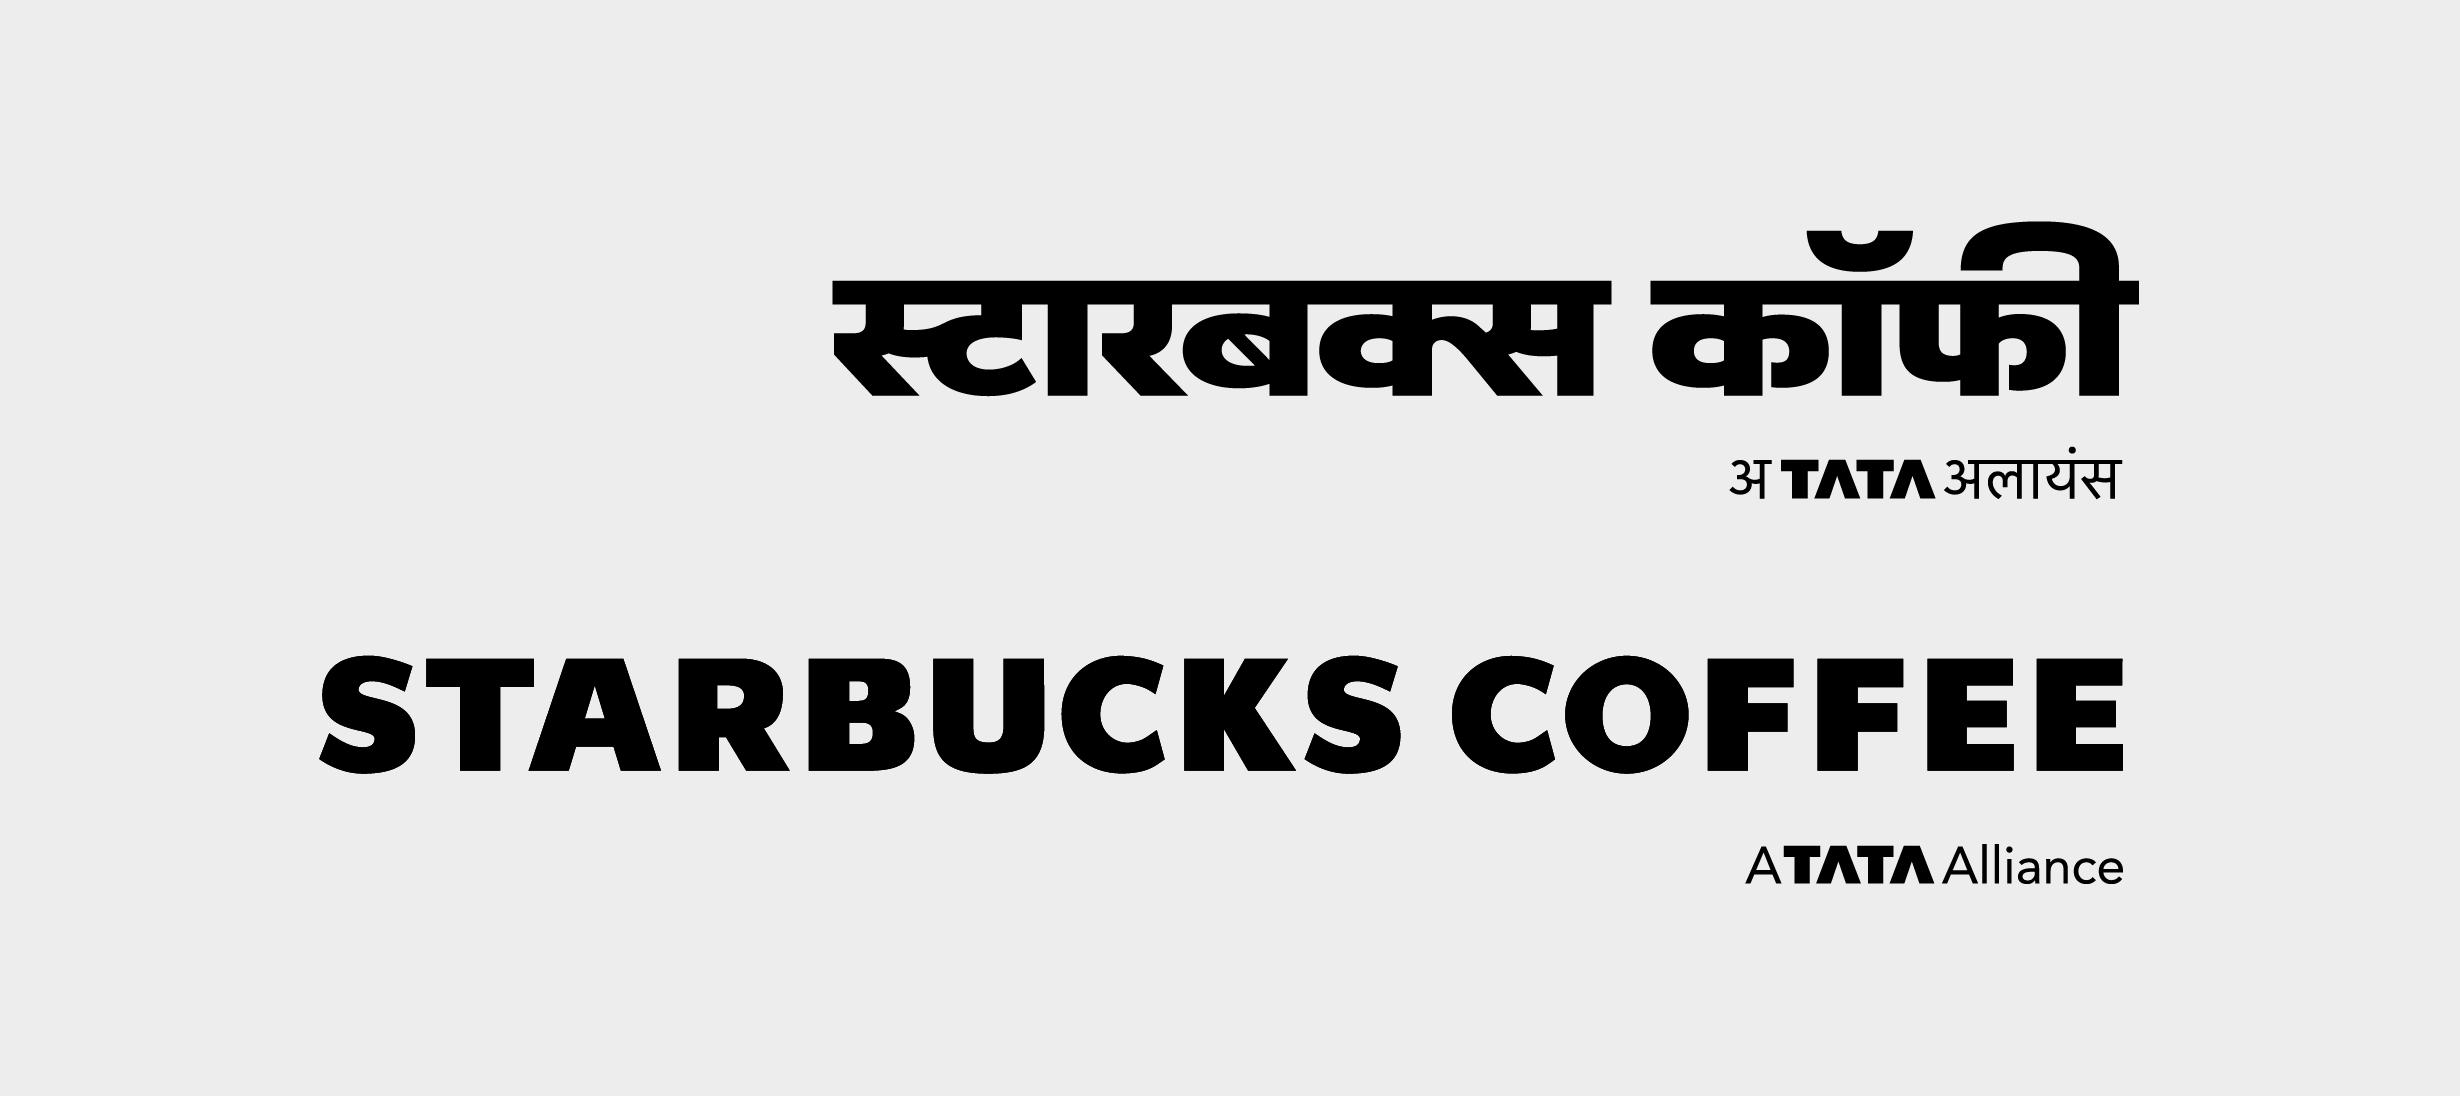 devanagari logotype for starbucks indian type foundry rh indiantypefoundry com starbucks logo font type starbucks logo font type